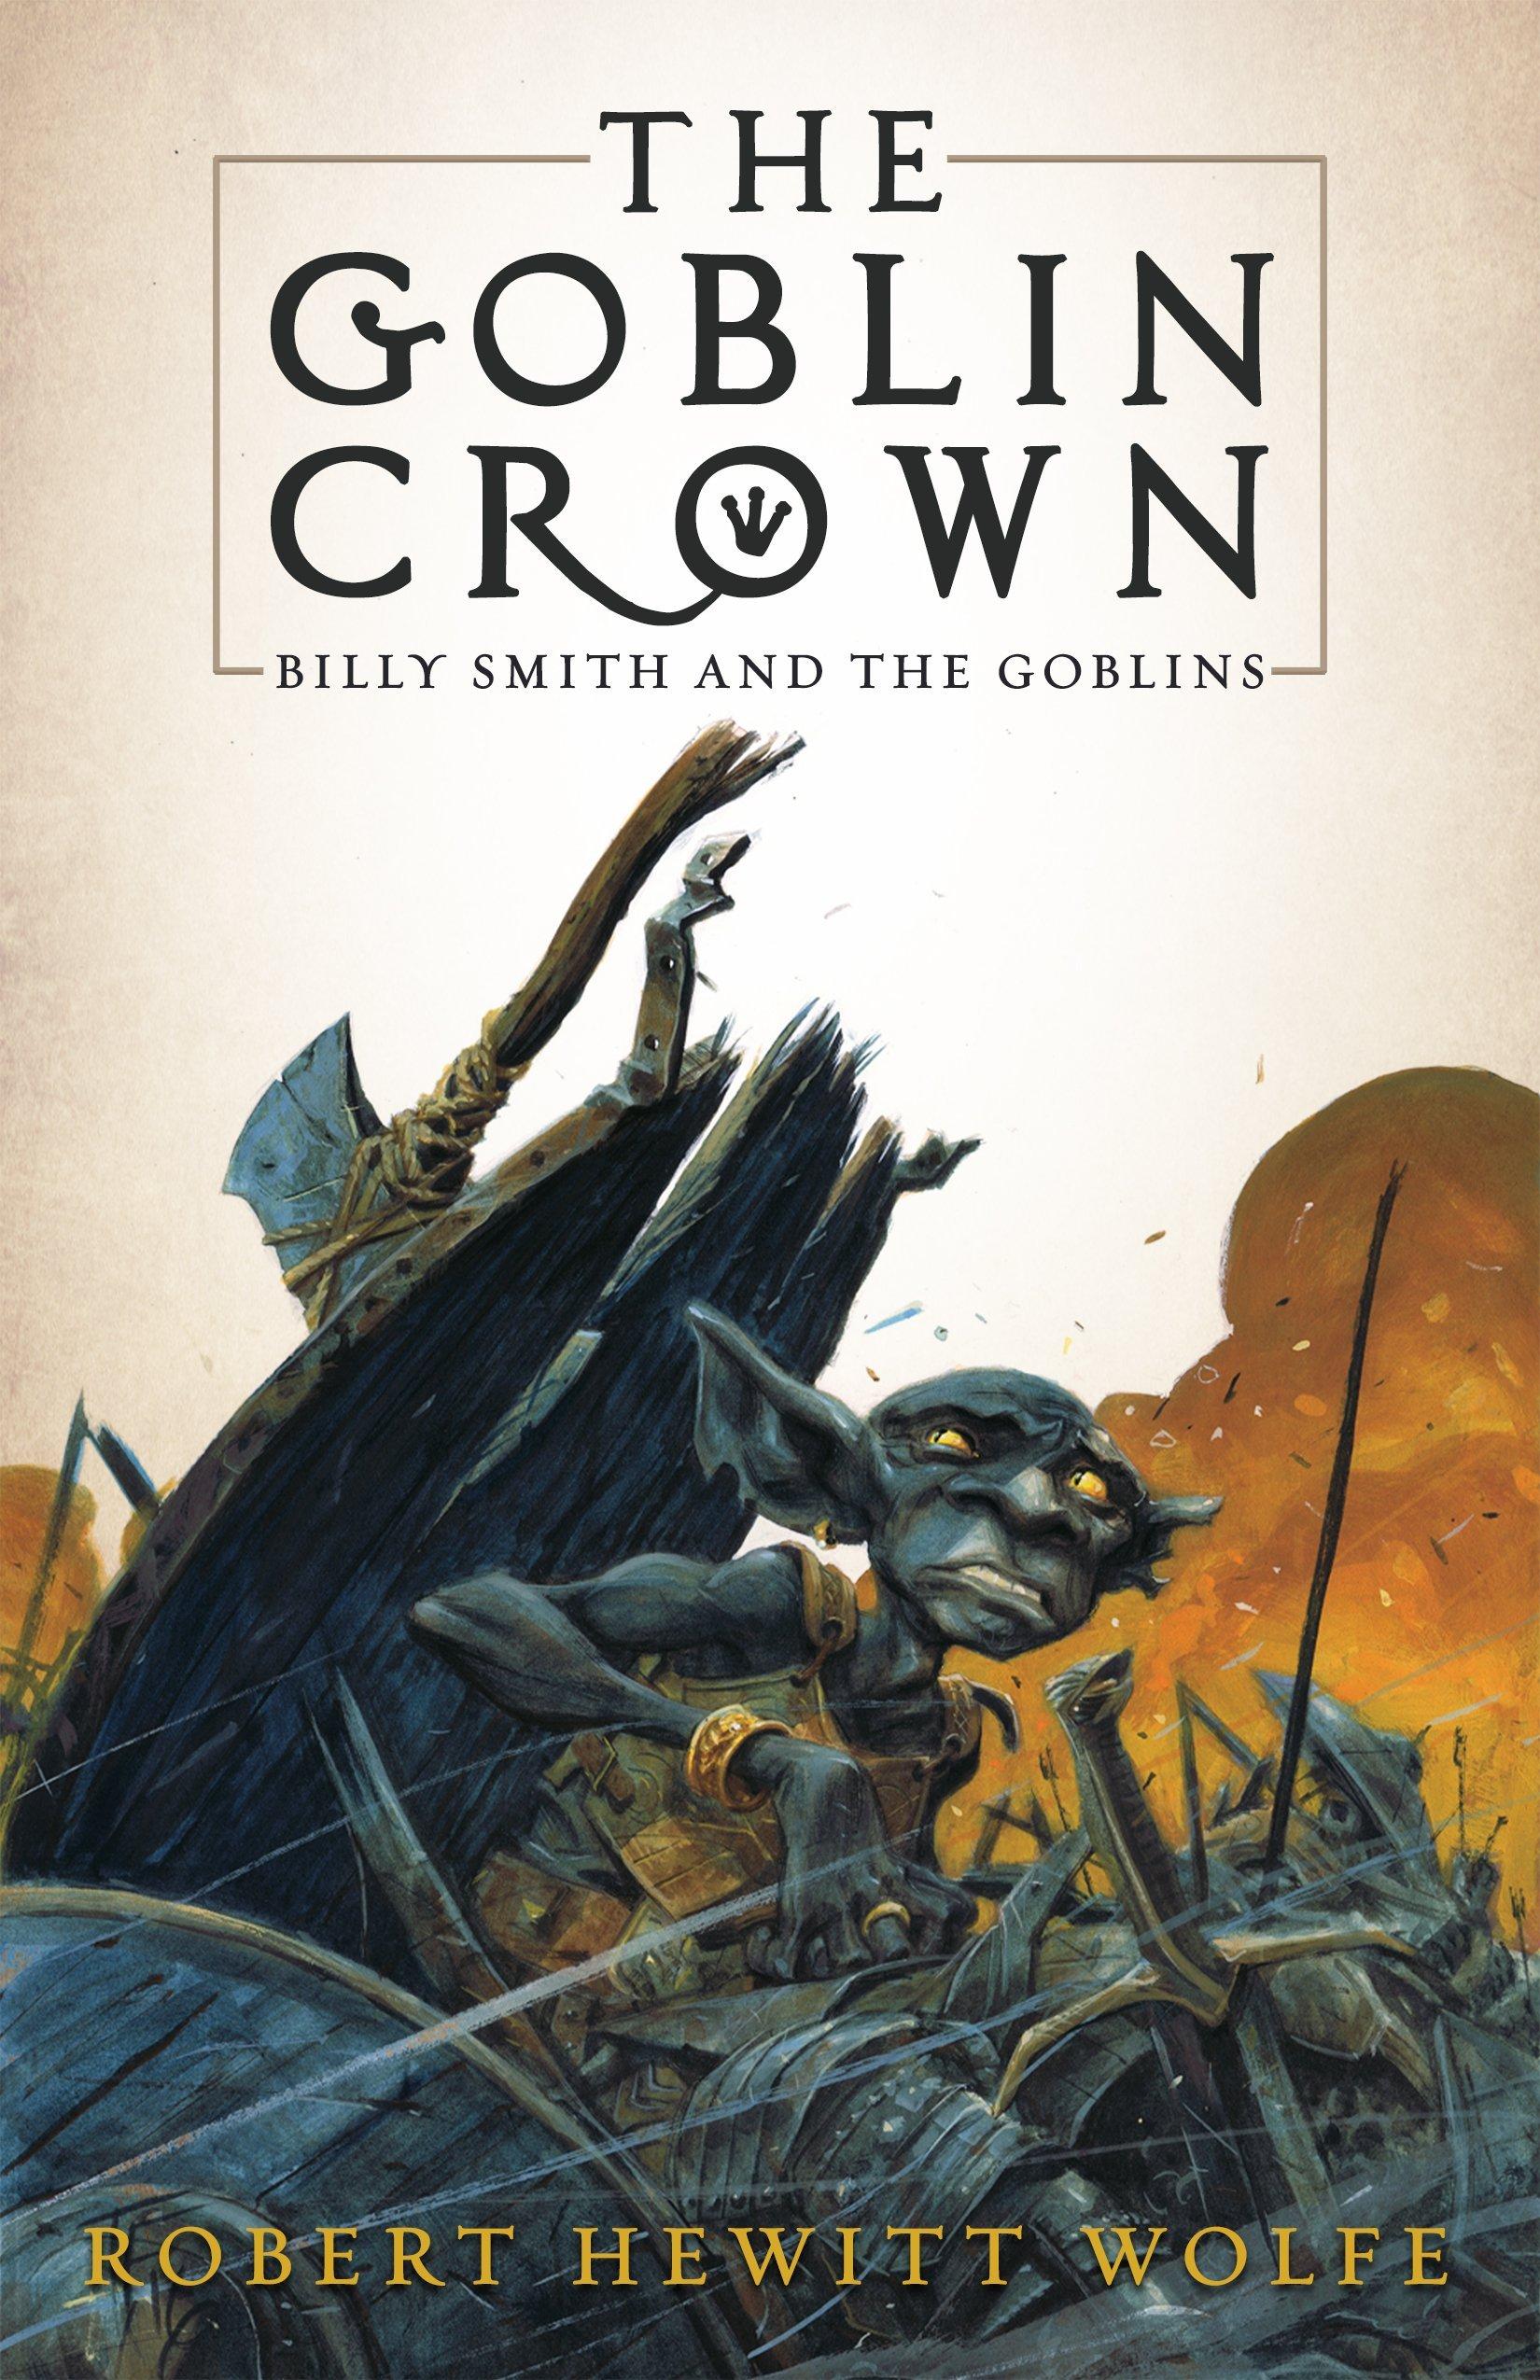 The Goblin Crown: Billy Smith and the Goblins, Book 1: Amazon.es: Robert Hewitt Wolfe: Libros en idiomas extranjeros